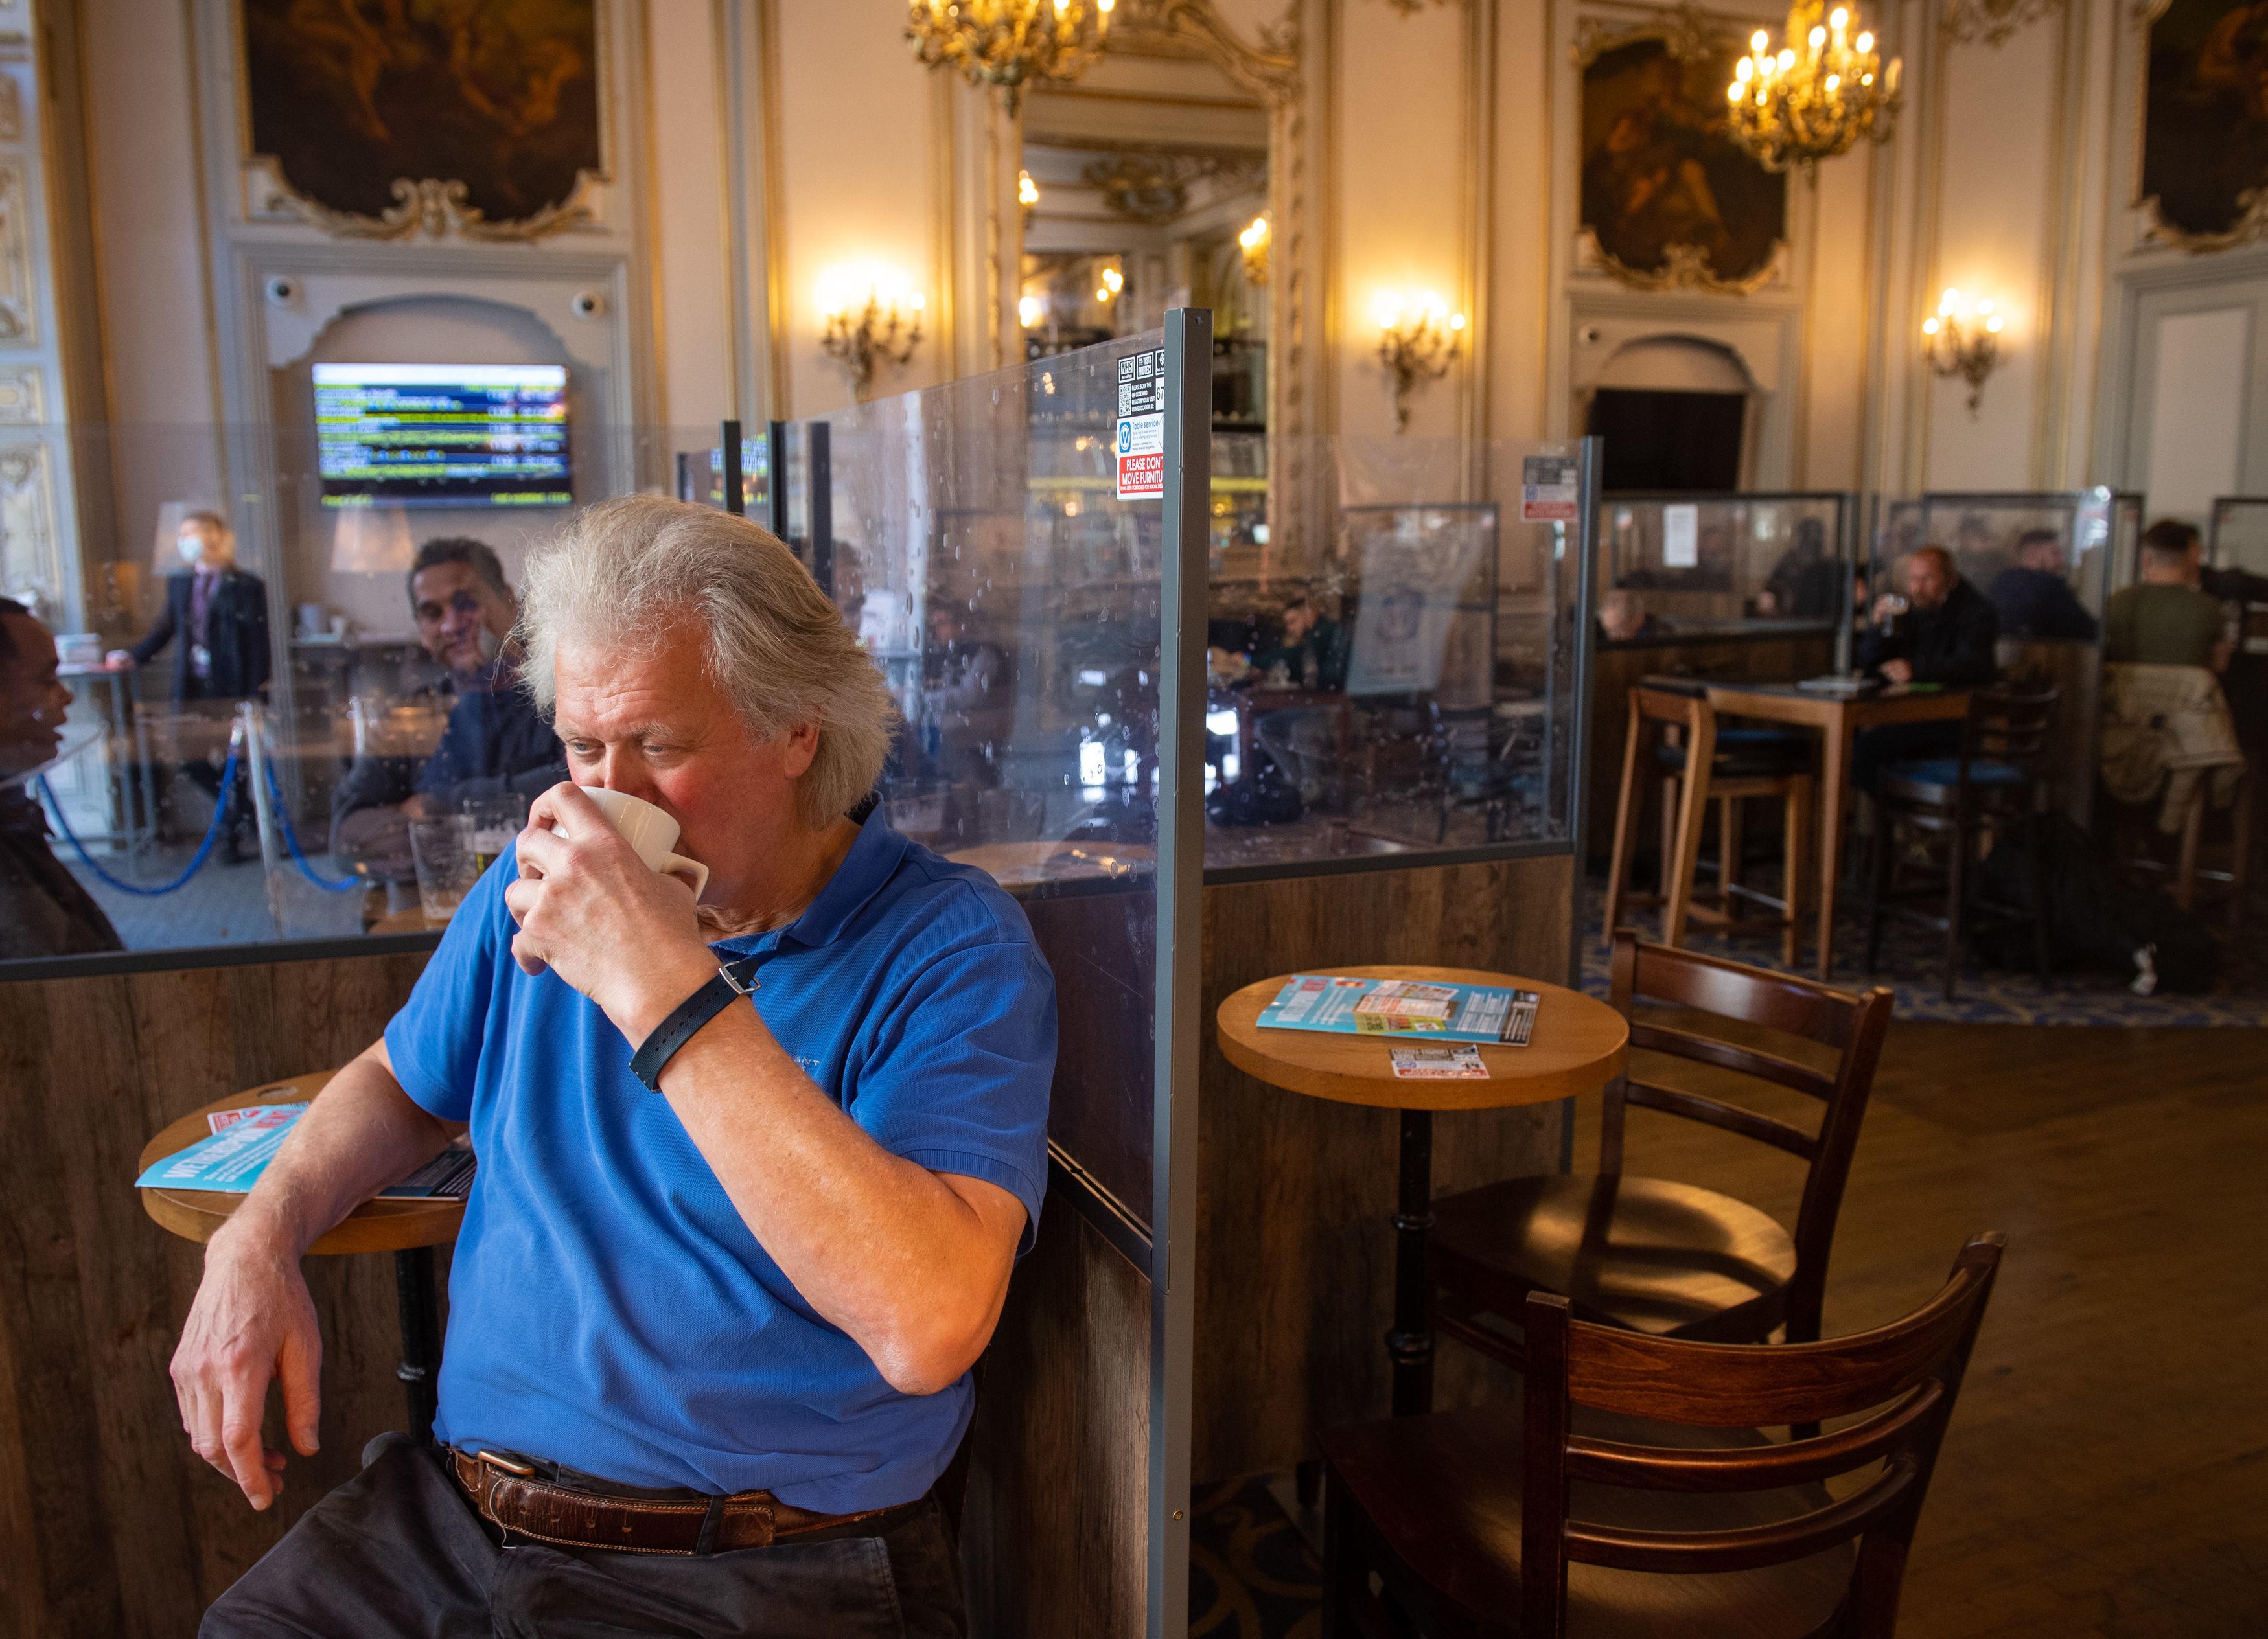 Chairman Tim Martin has slammed lockdown for ruining pub trade